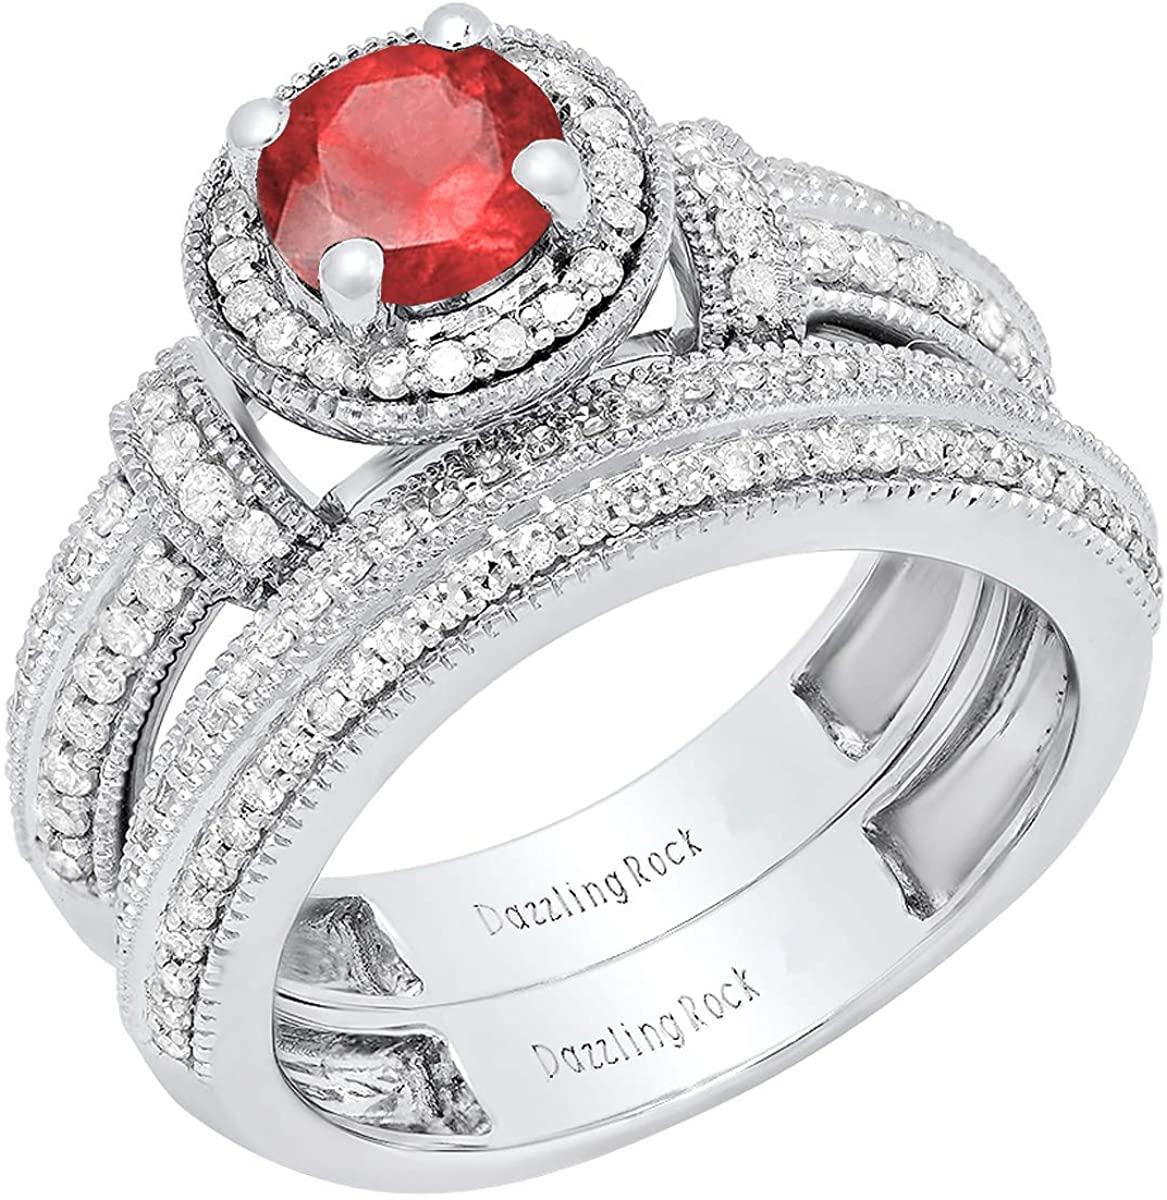 Dazzlingrock Collection 14K 6 MM Round Gemstone & White Diamond Ladies Engagement Bridal Band Ring Set, White Gold